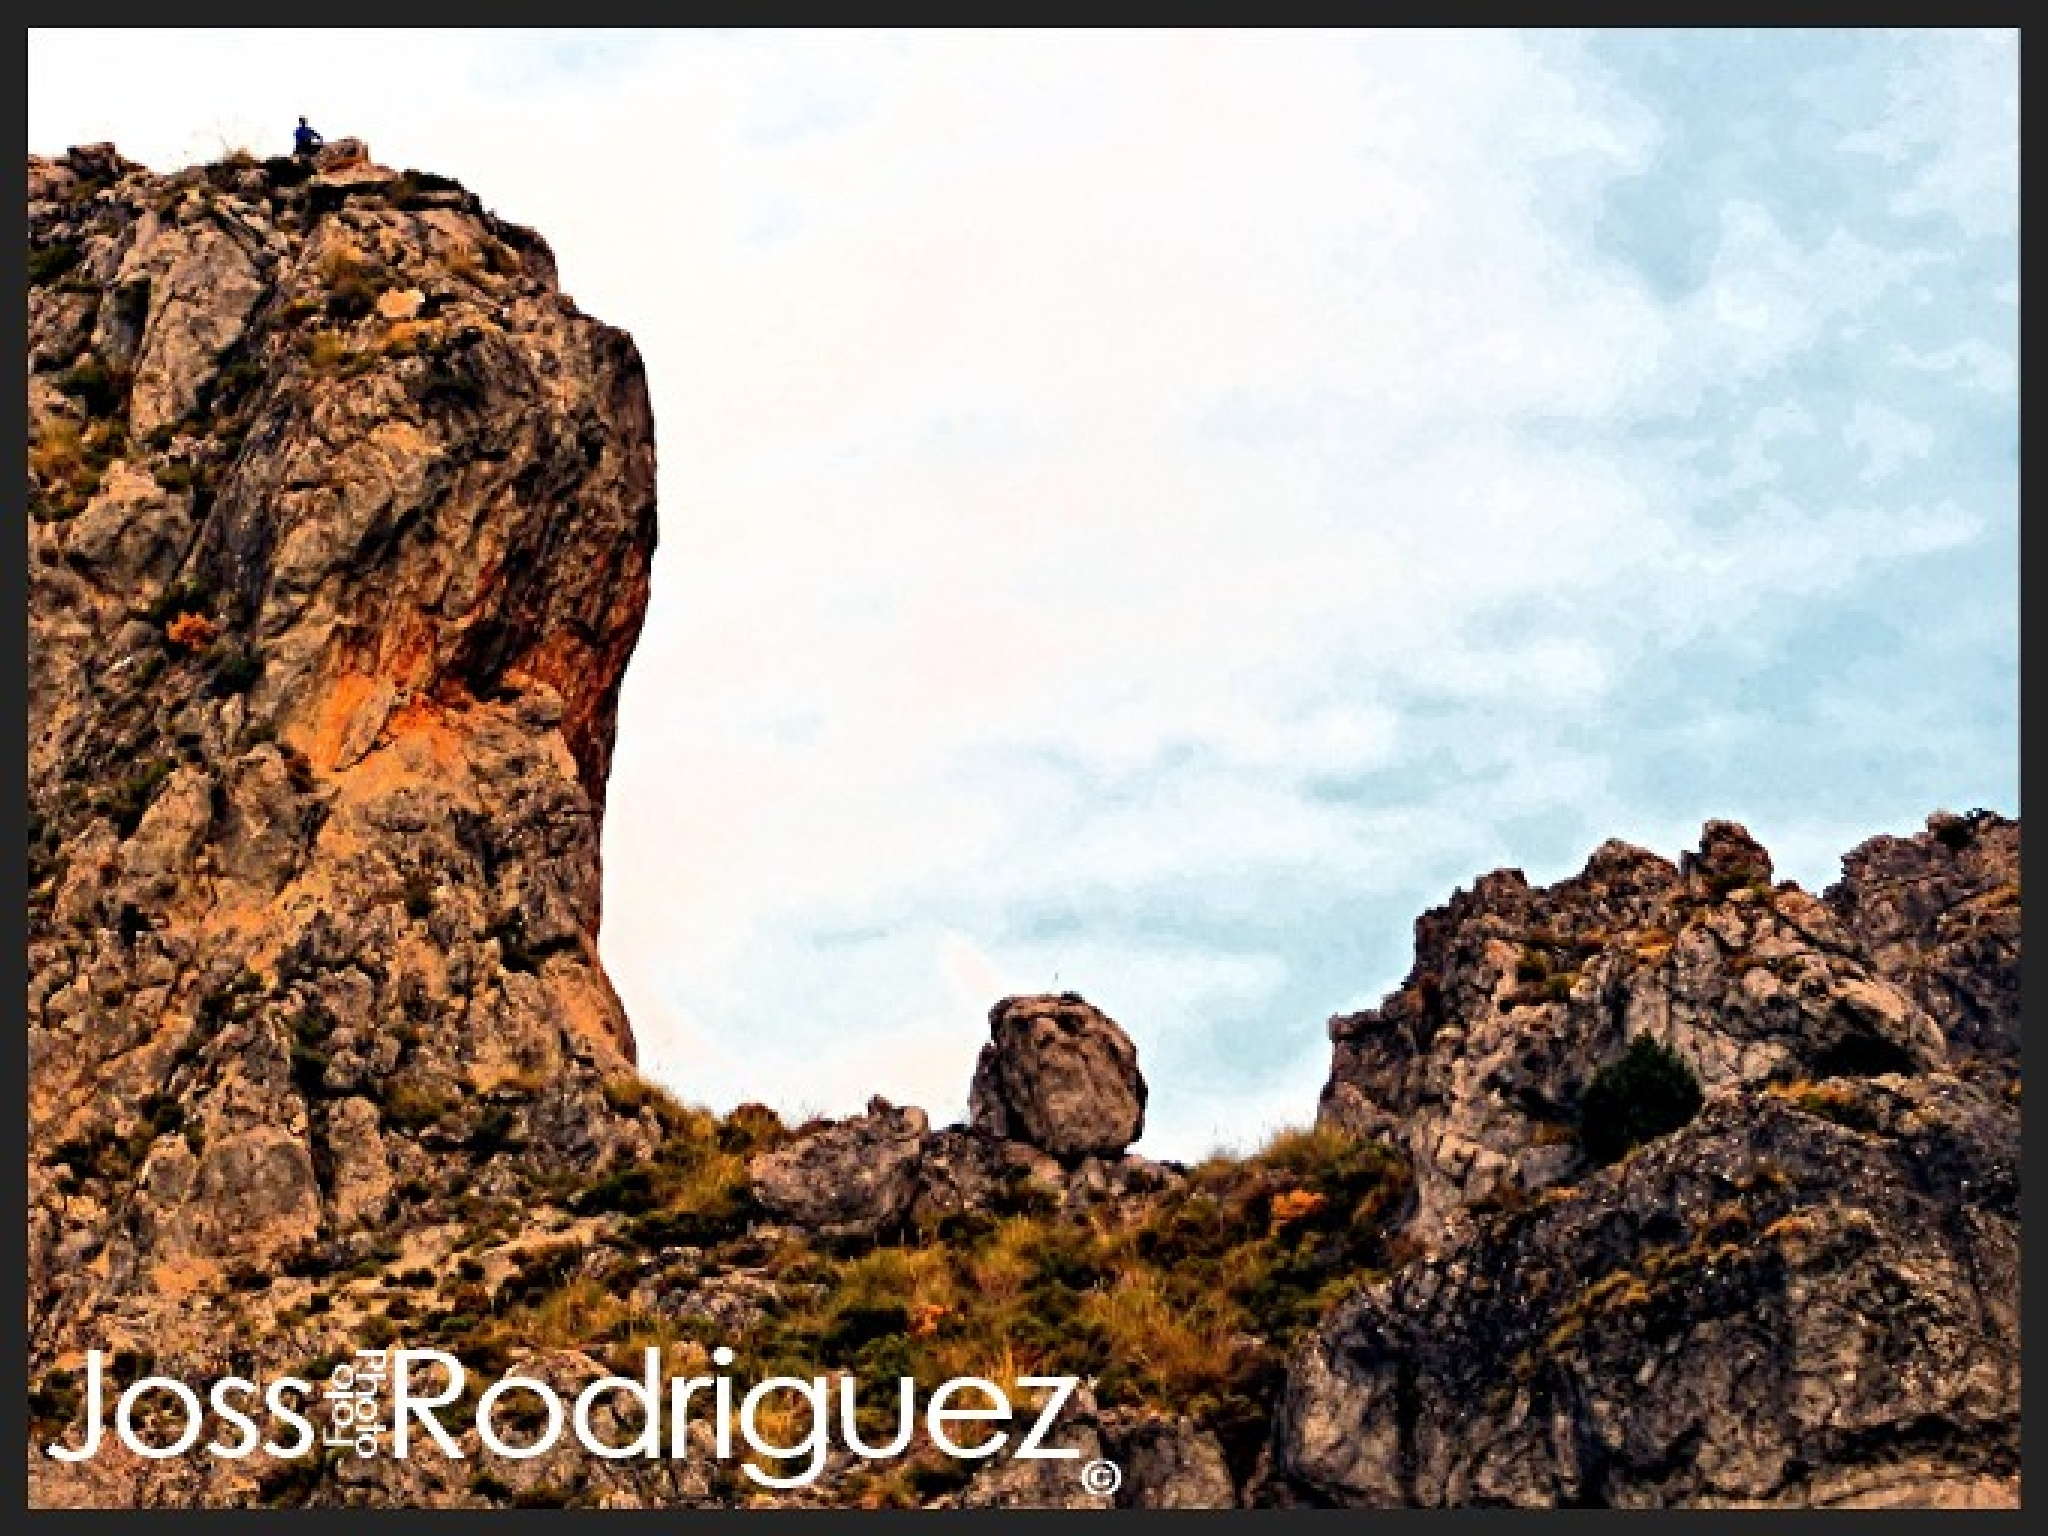 Los Cahorros by Joss Rodríguez